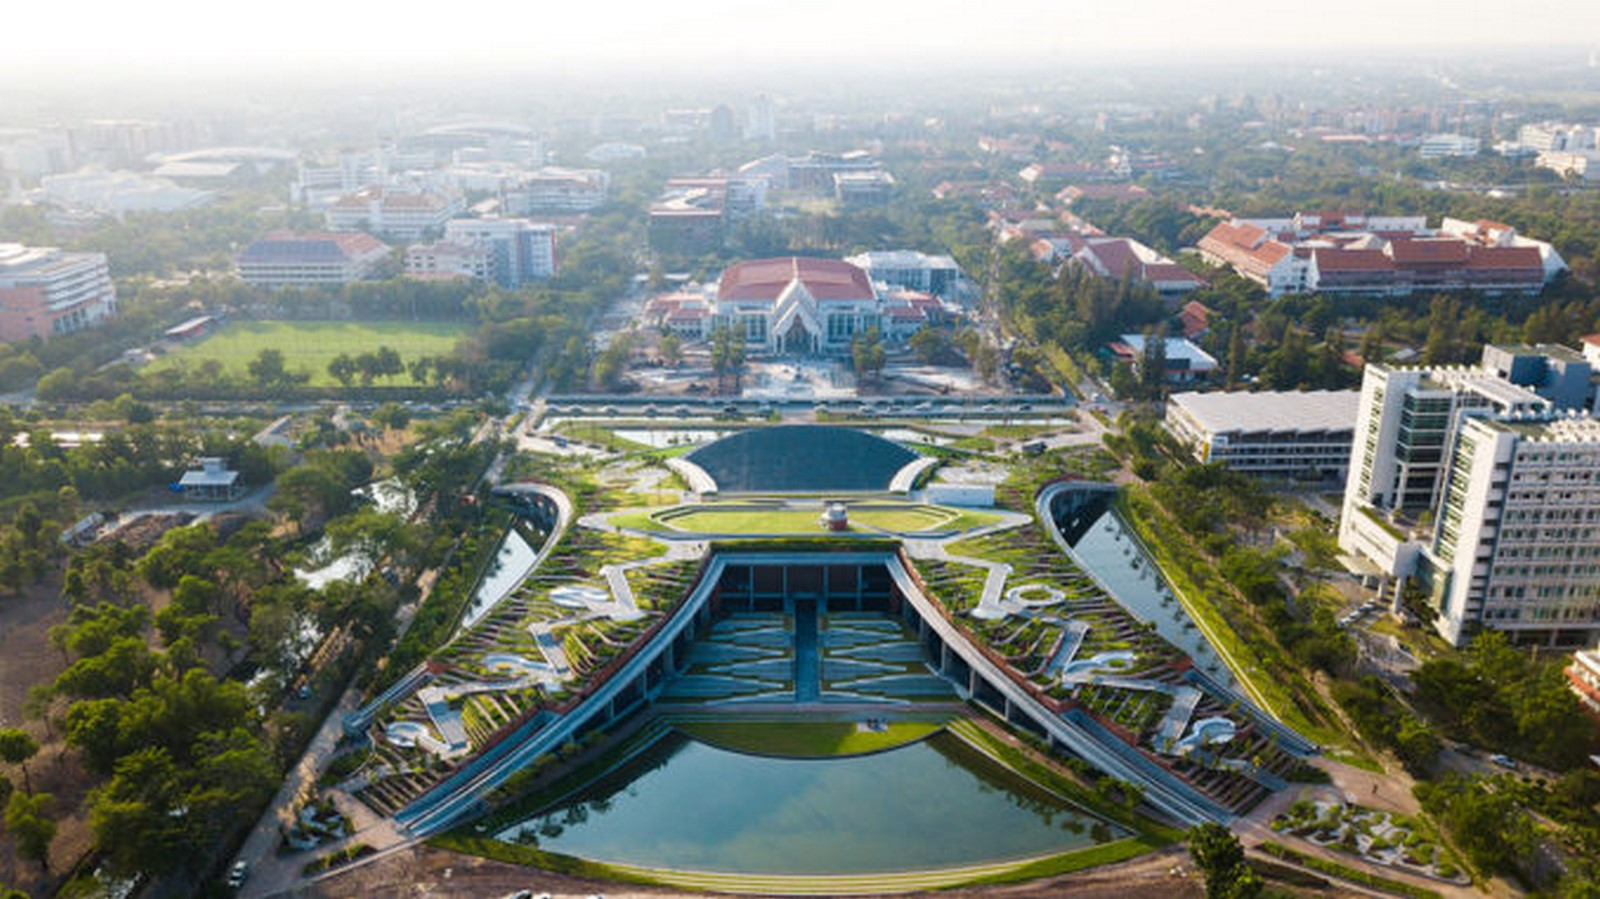 Thammasat University Urban Rooftop Farm - Sheet1